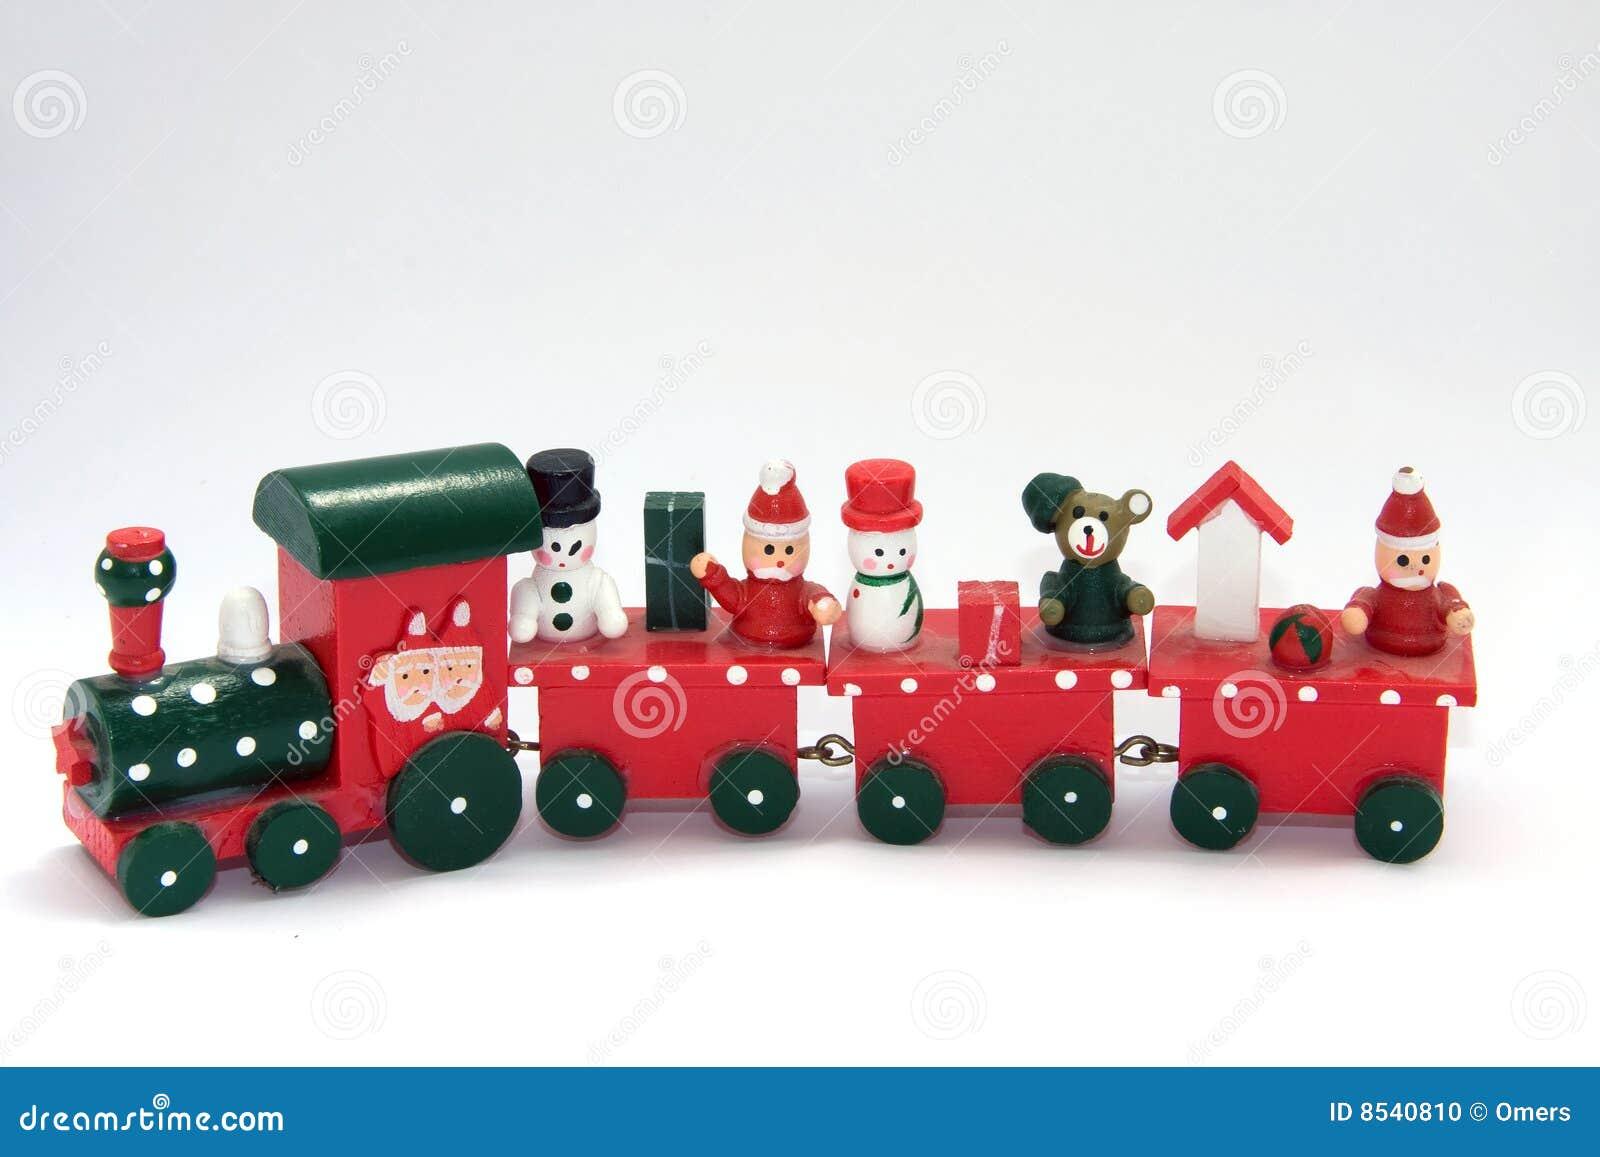 Toy Train Stock Photo - Image: 8540810 Happy Child Clipart